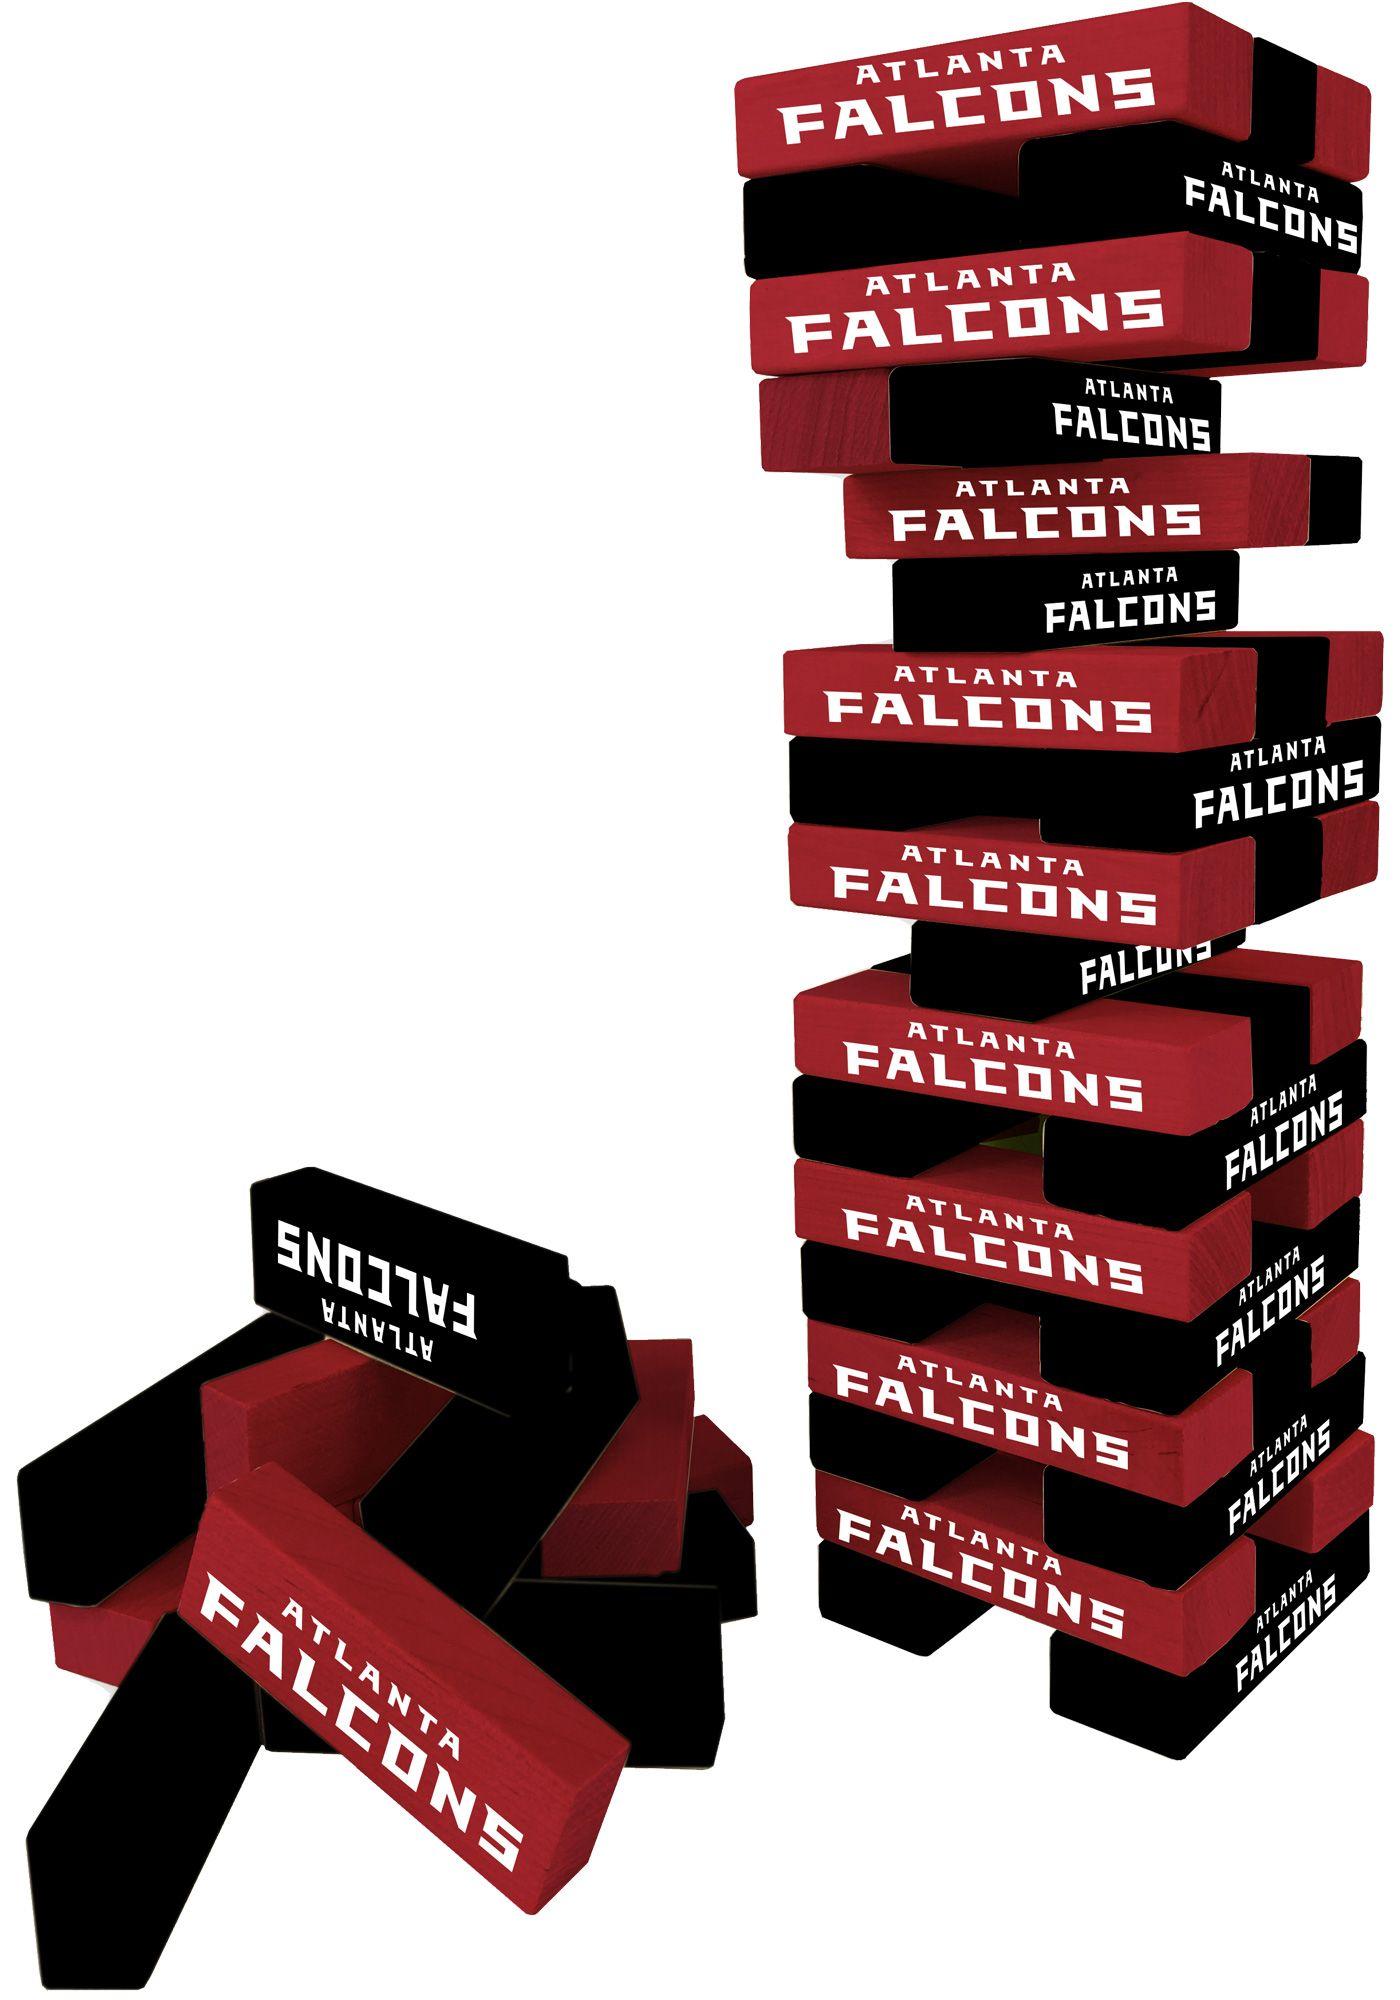 Wild Sports Atlanta Falcons Table Top Stackers